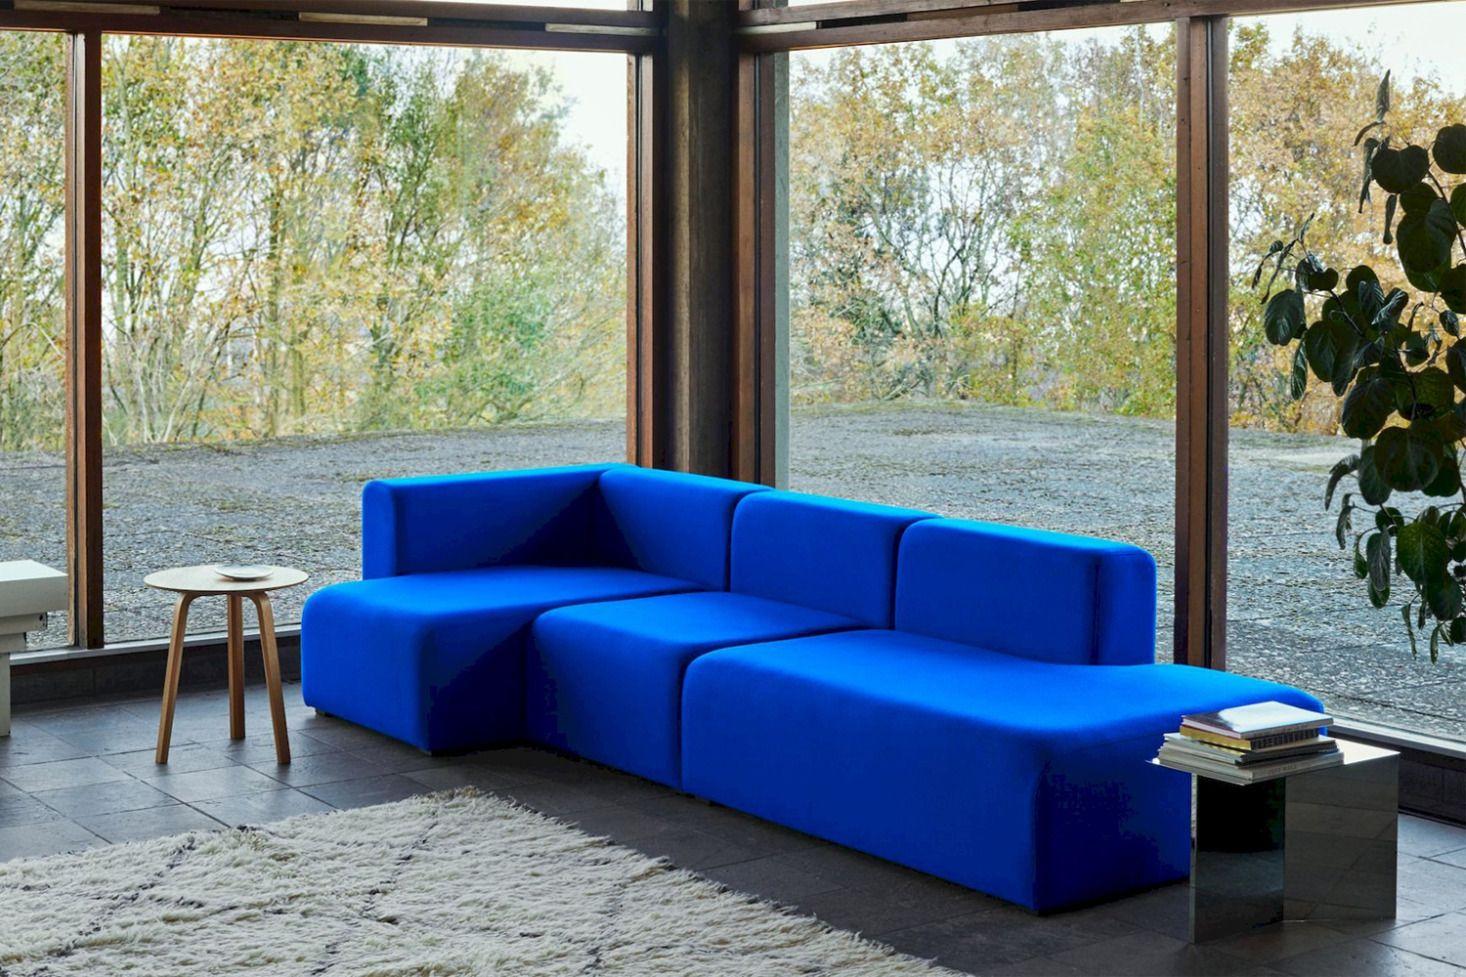 10 Easy Pieces Modular Building Block Sectional Sofas Remodelista Modular Sectional Sofa Modular Sofa Sofa